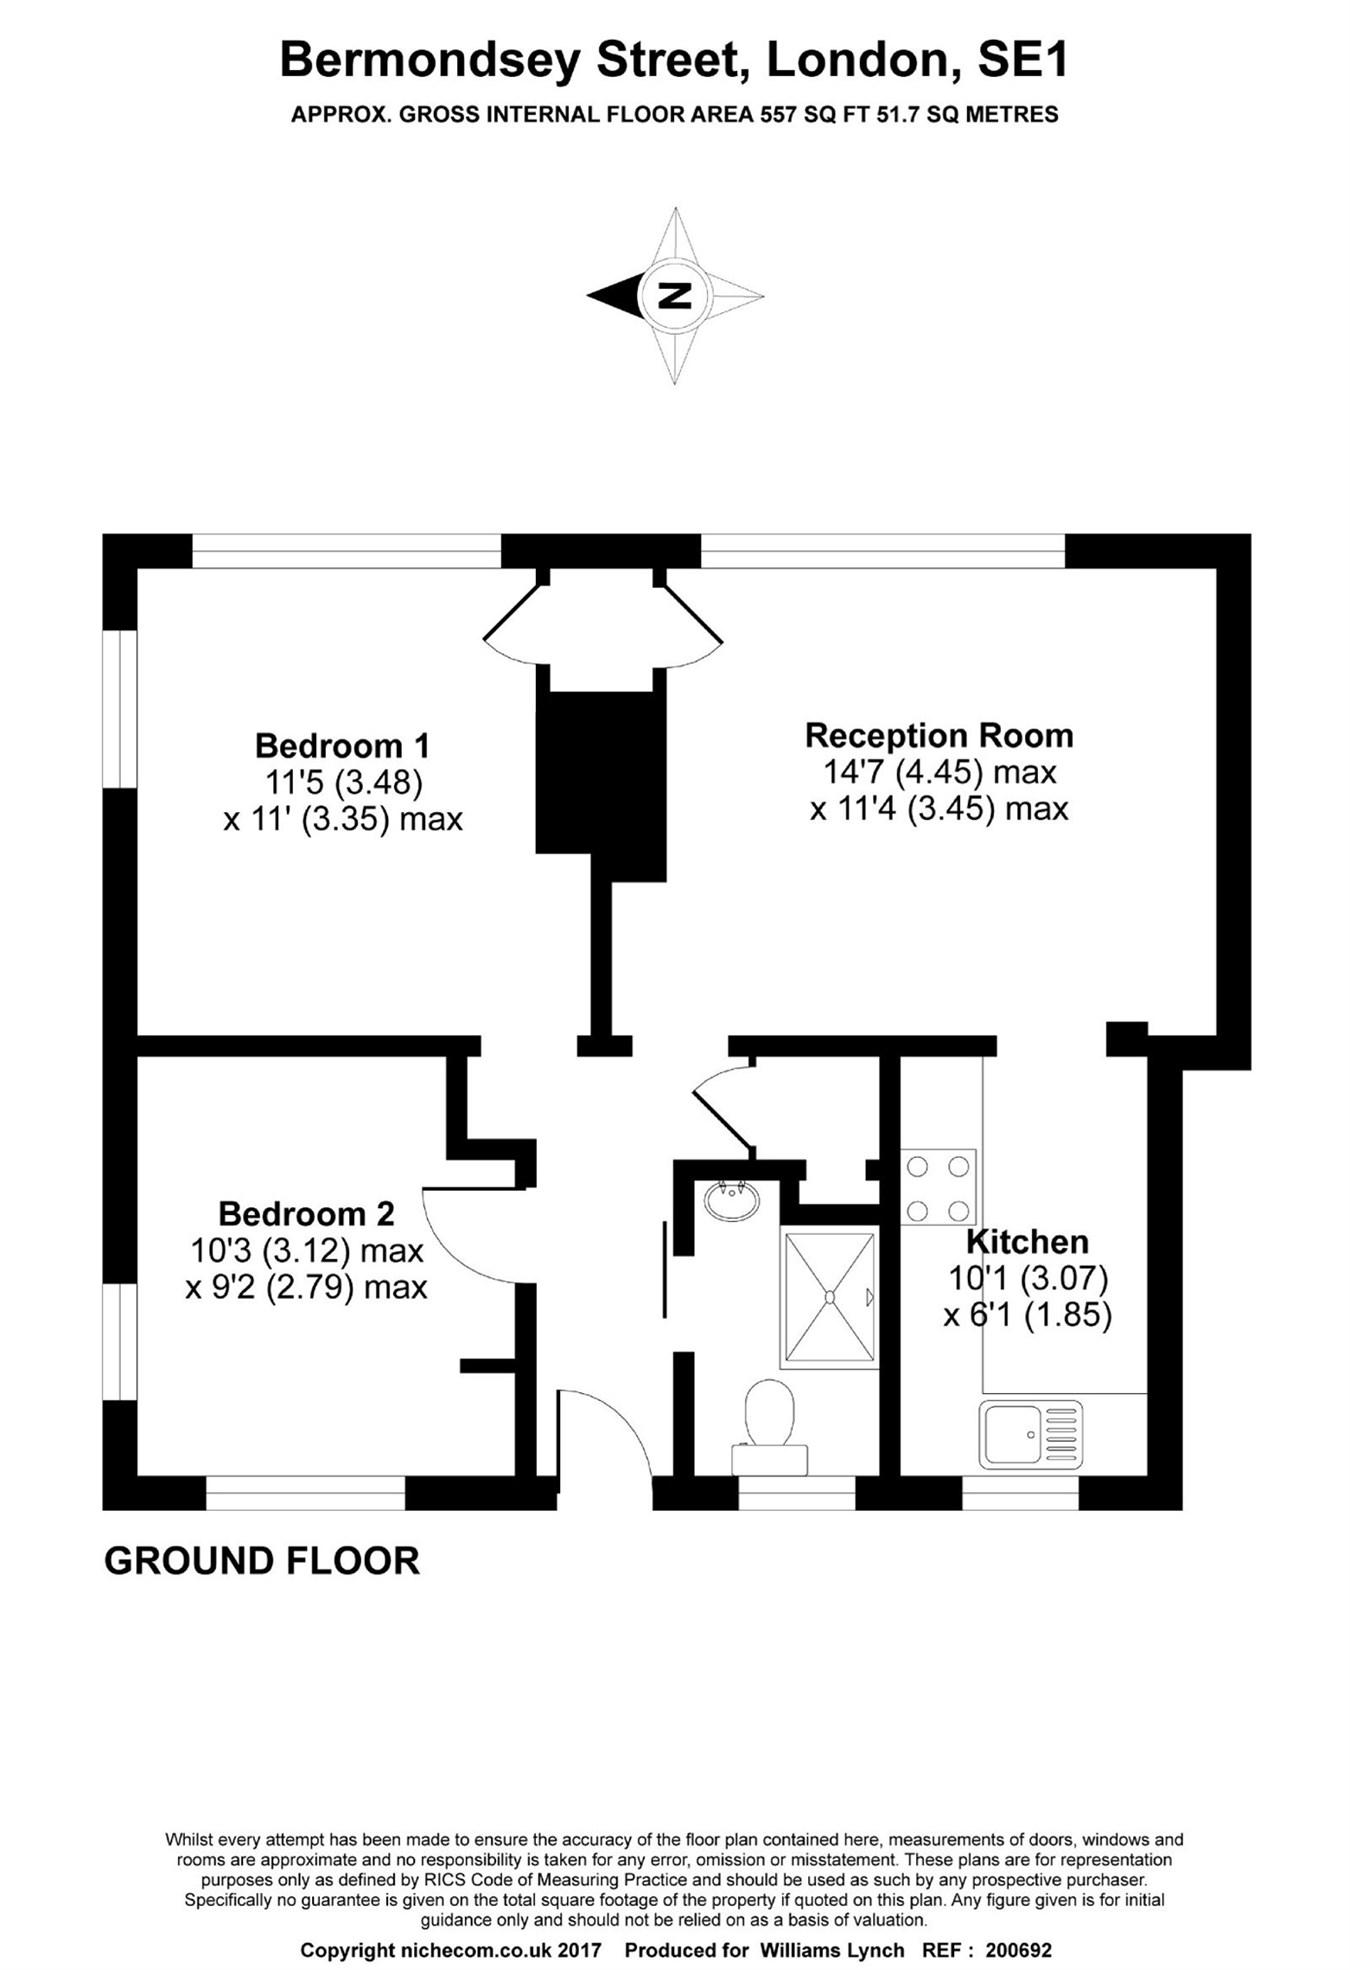 2 Bedrooms Flat to rent in Bermondsey Street, London SE1